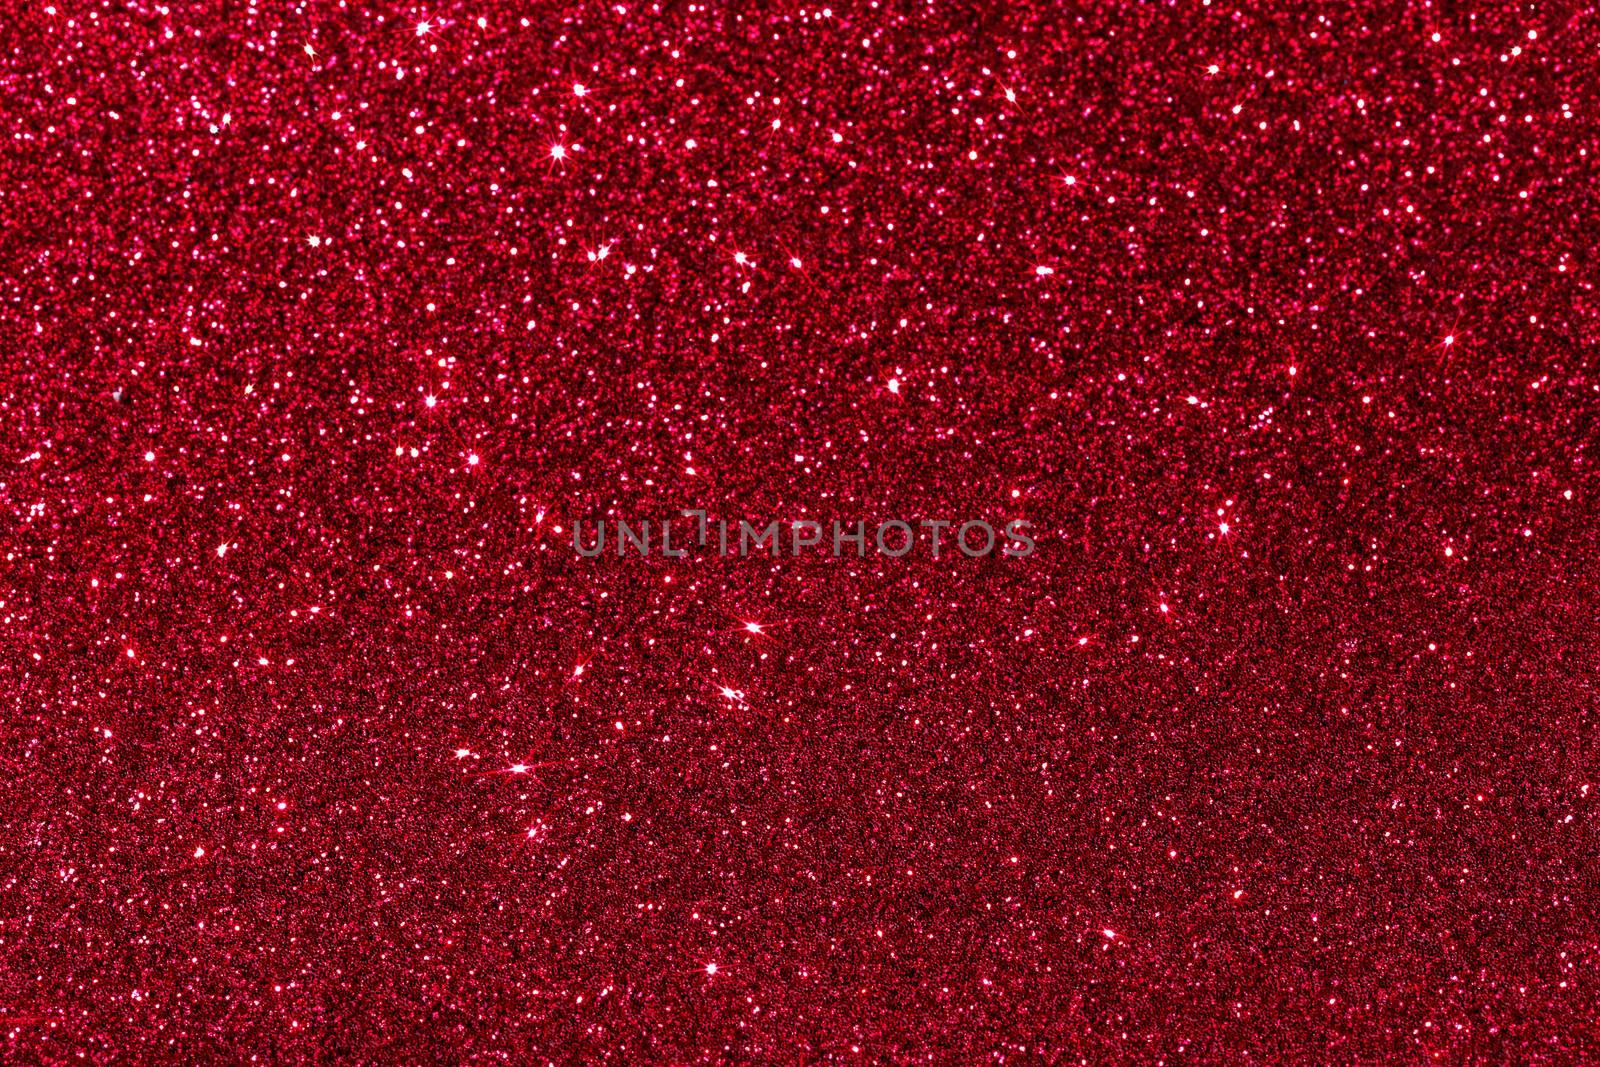 Red glitter texture holidays background. Macro shot